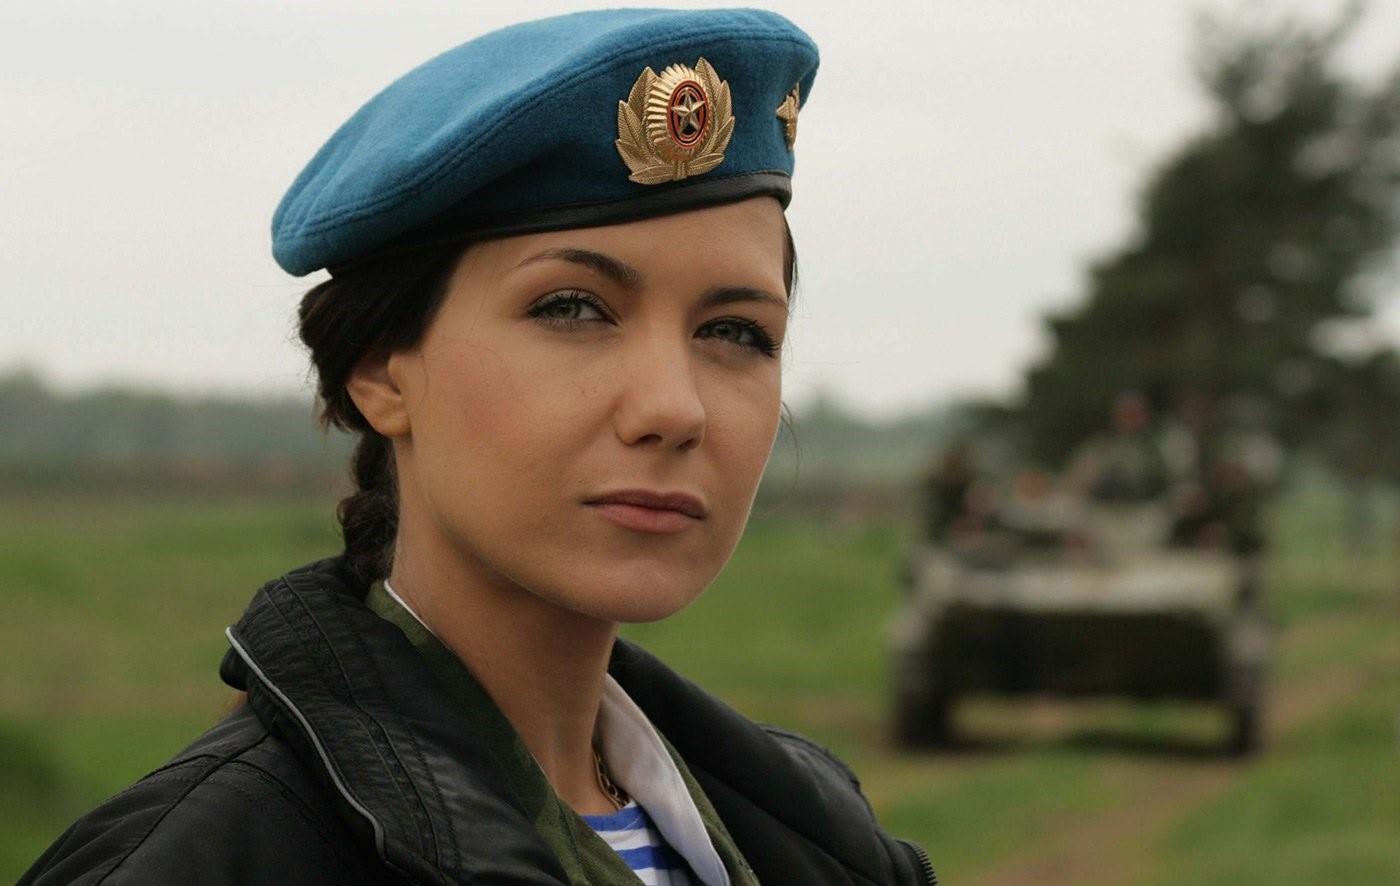 Женщина-солдат в голубом берете